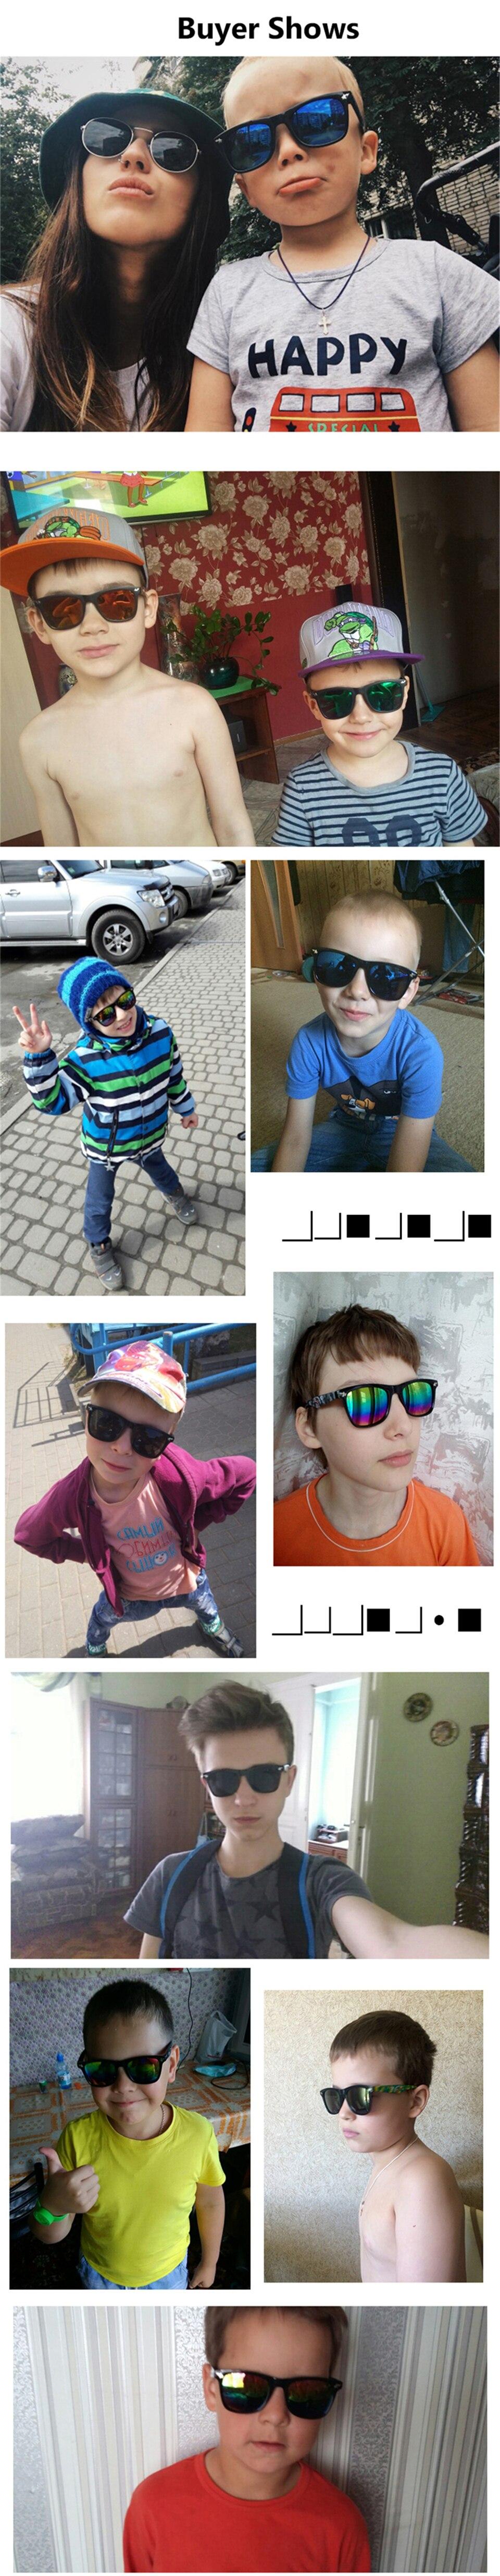 Fashion Kids Sunglasses lovely Sunglasses Mosaic Boys Girls Pixel Eyewares With Case Children Gift (29)